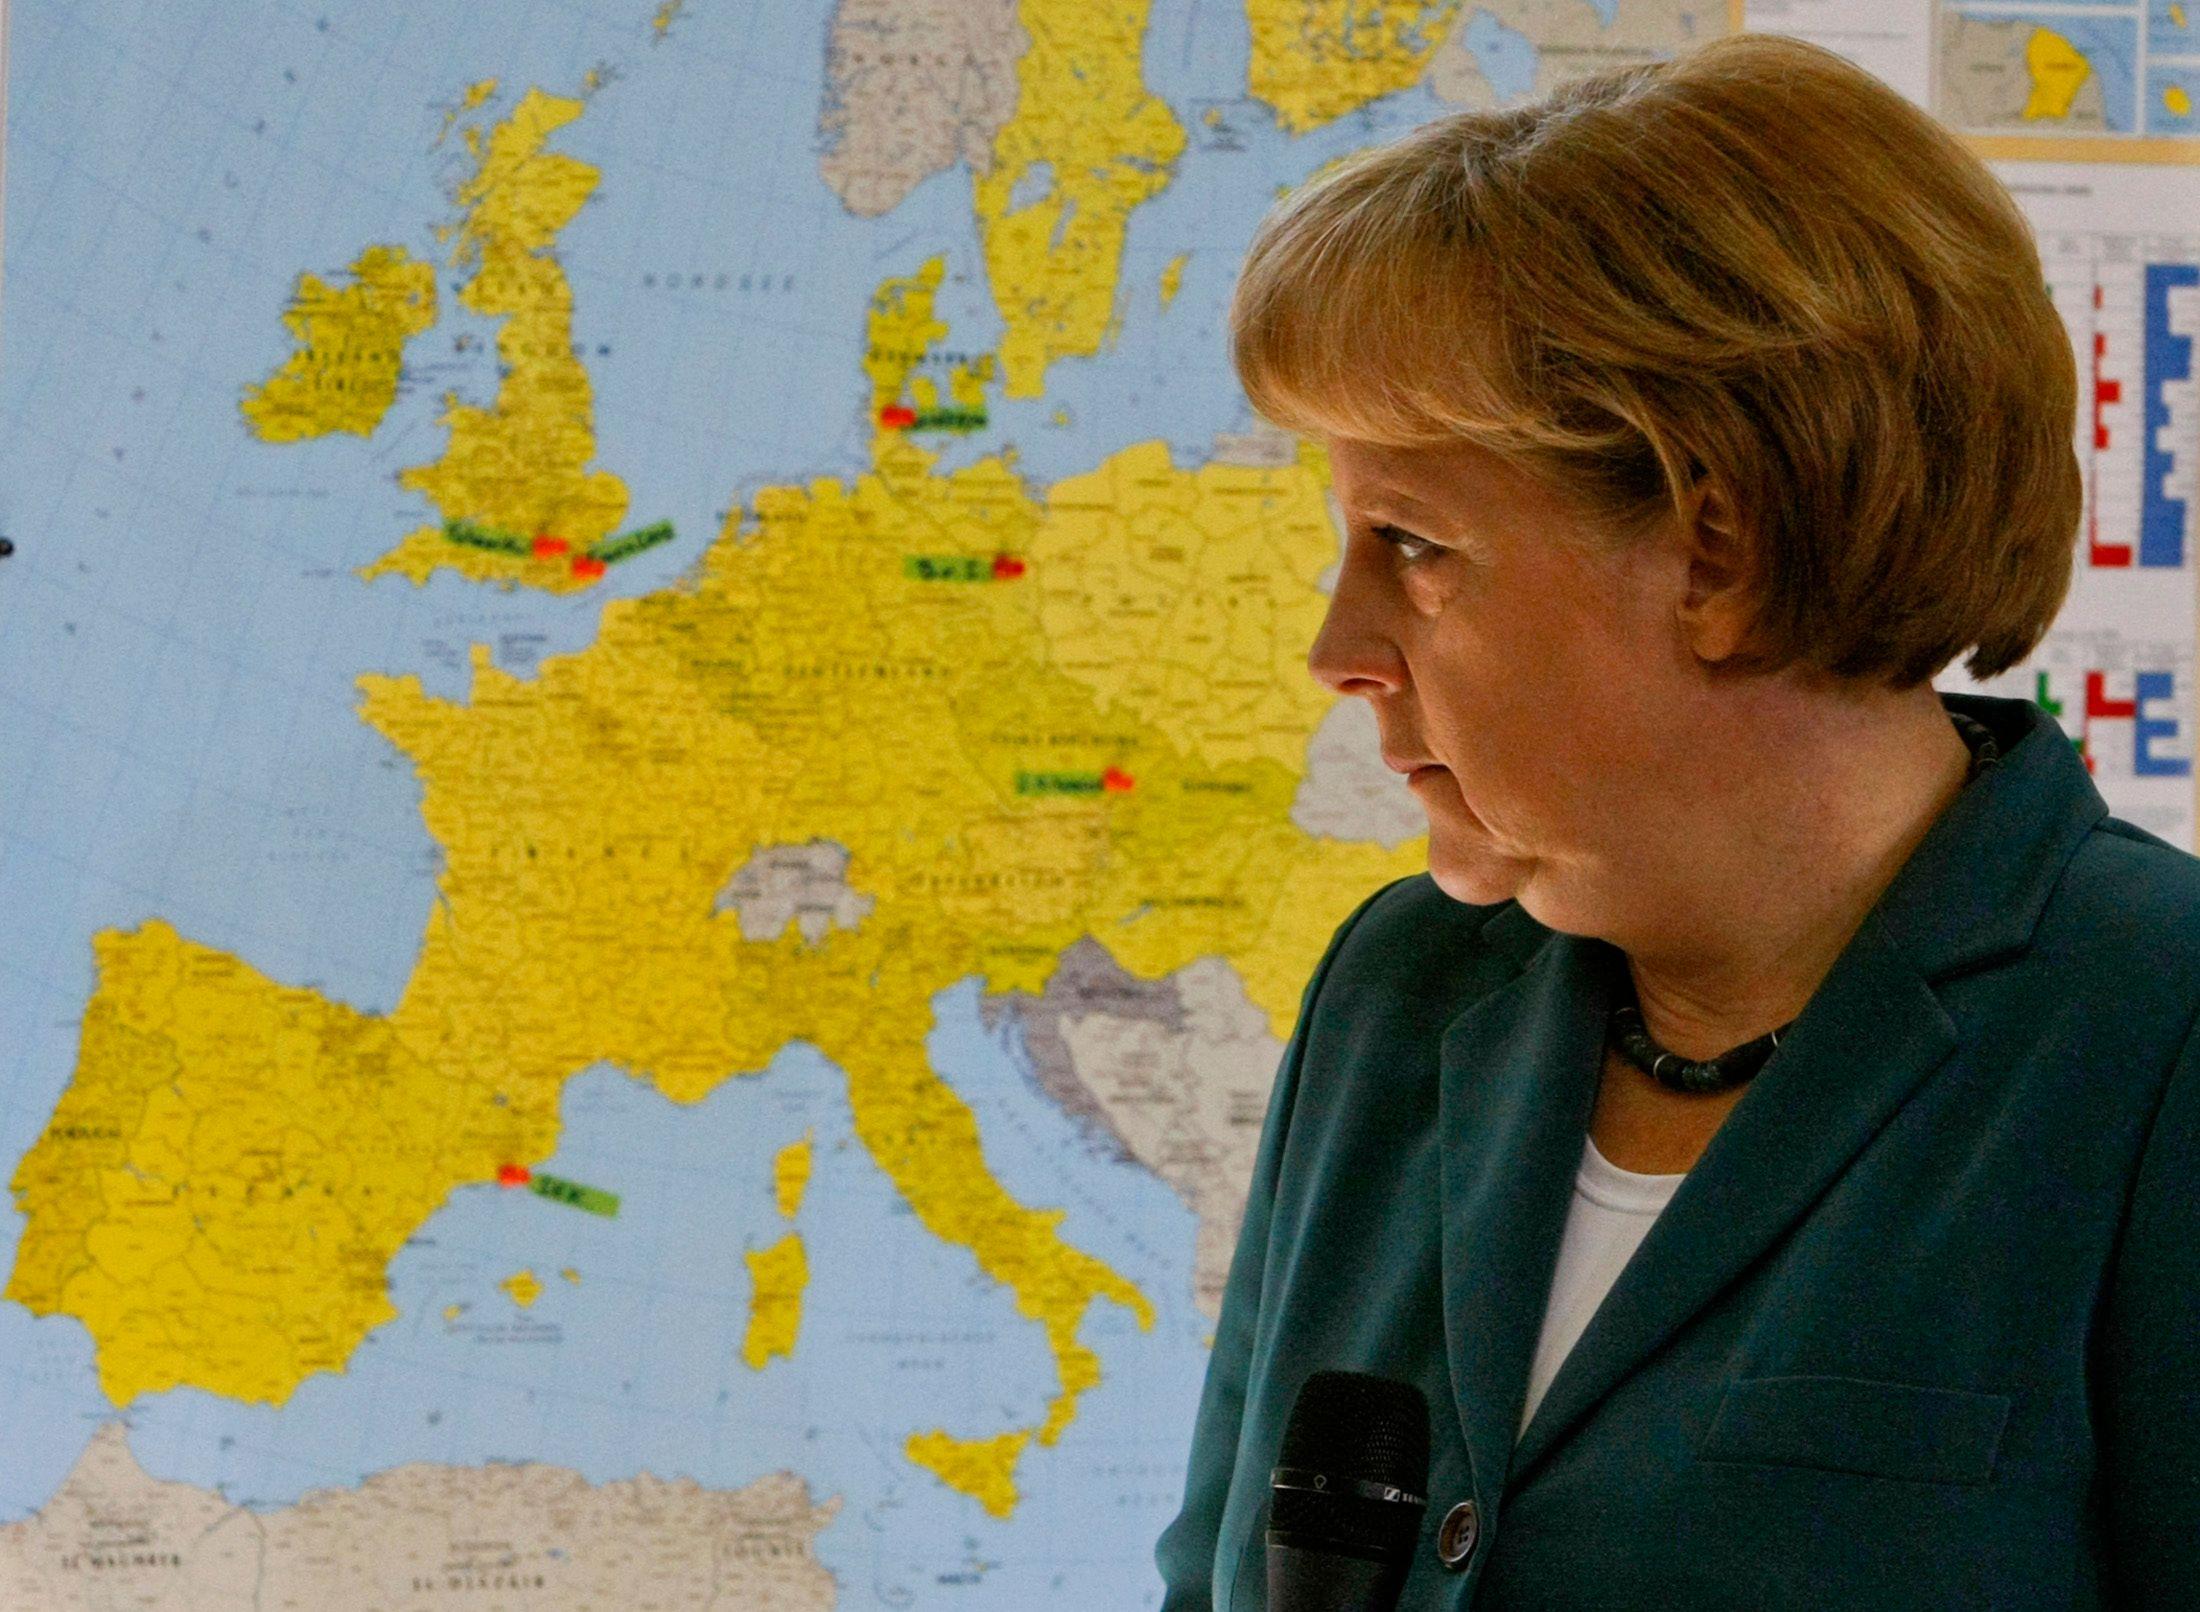 Angela Merkel devant une carte de l'Europe